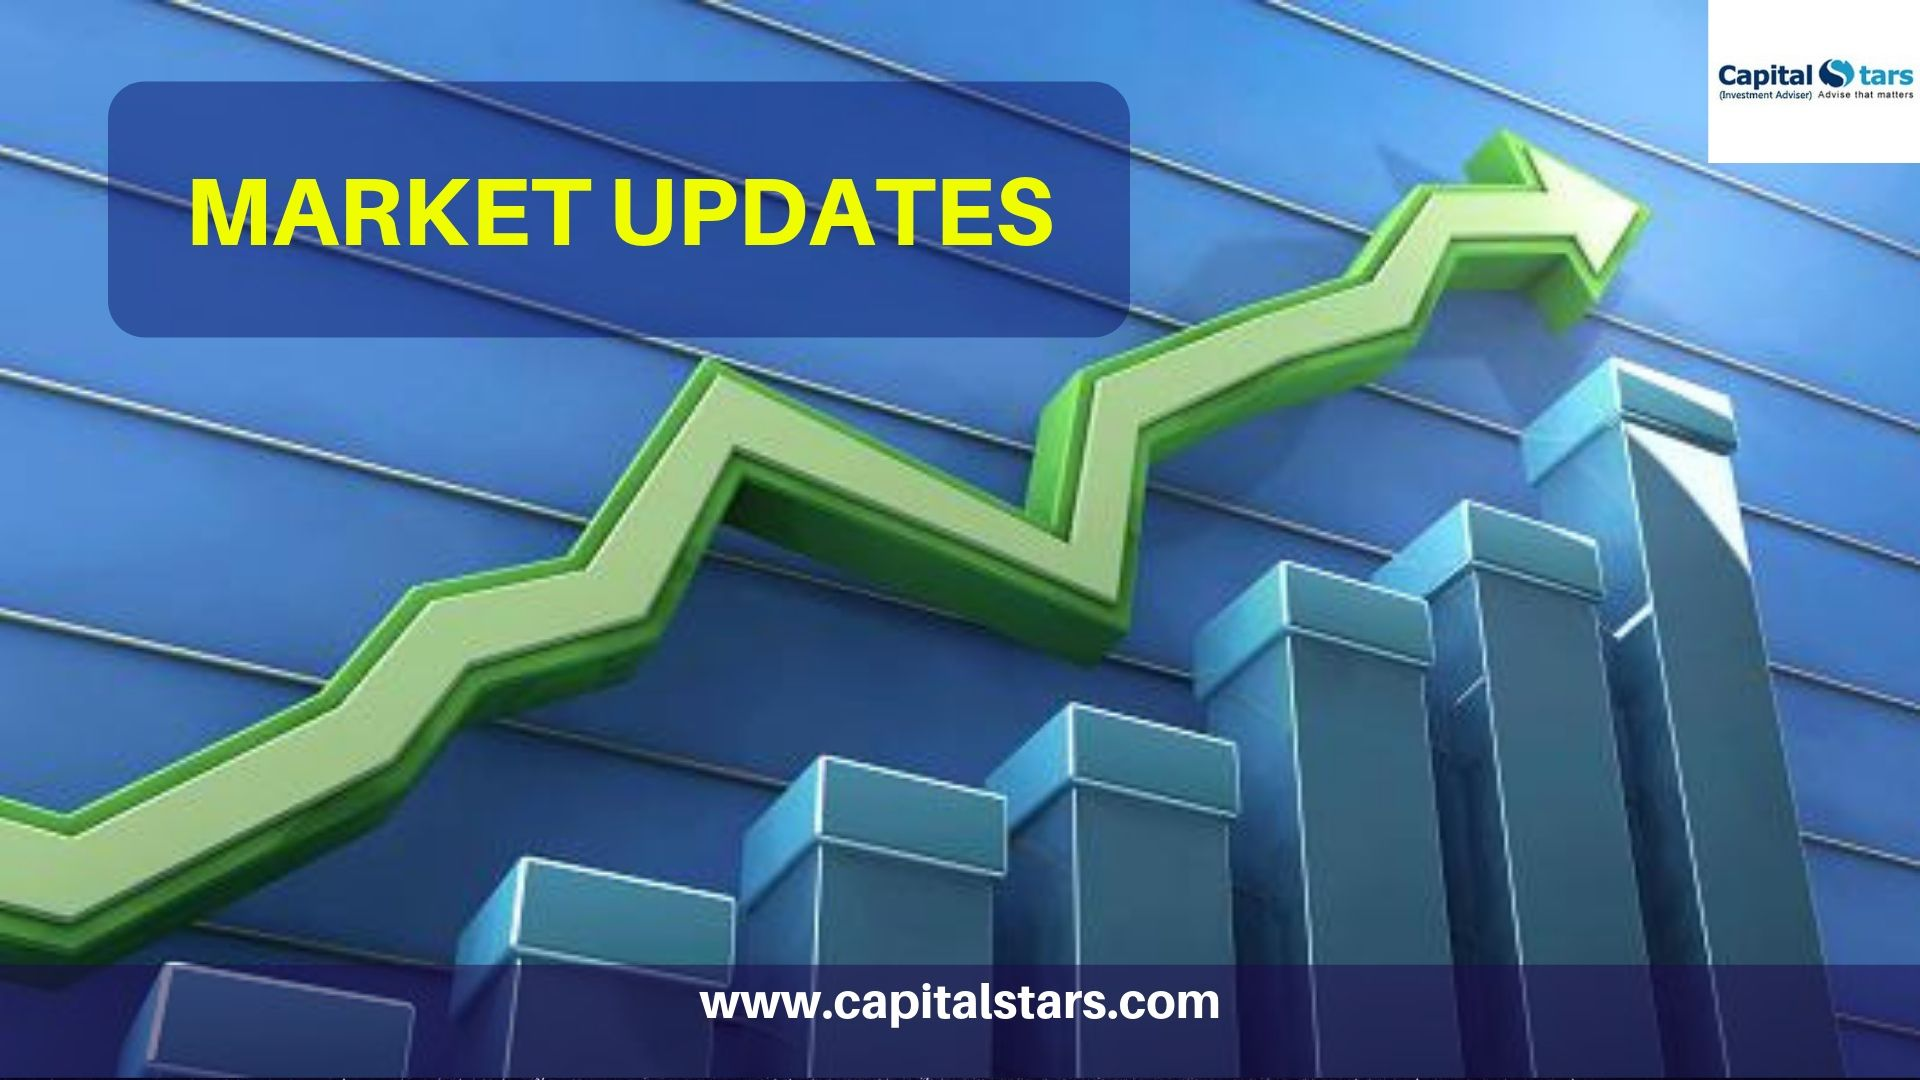 teeka tiwari genesis technology stock price